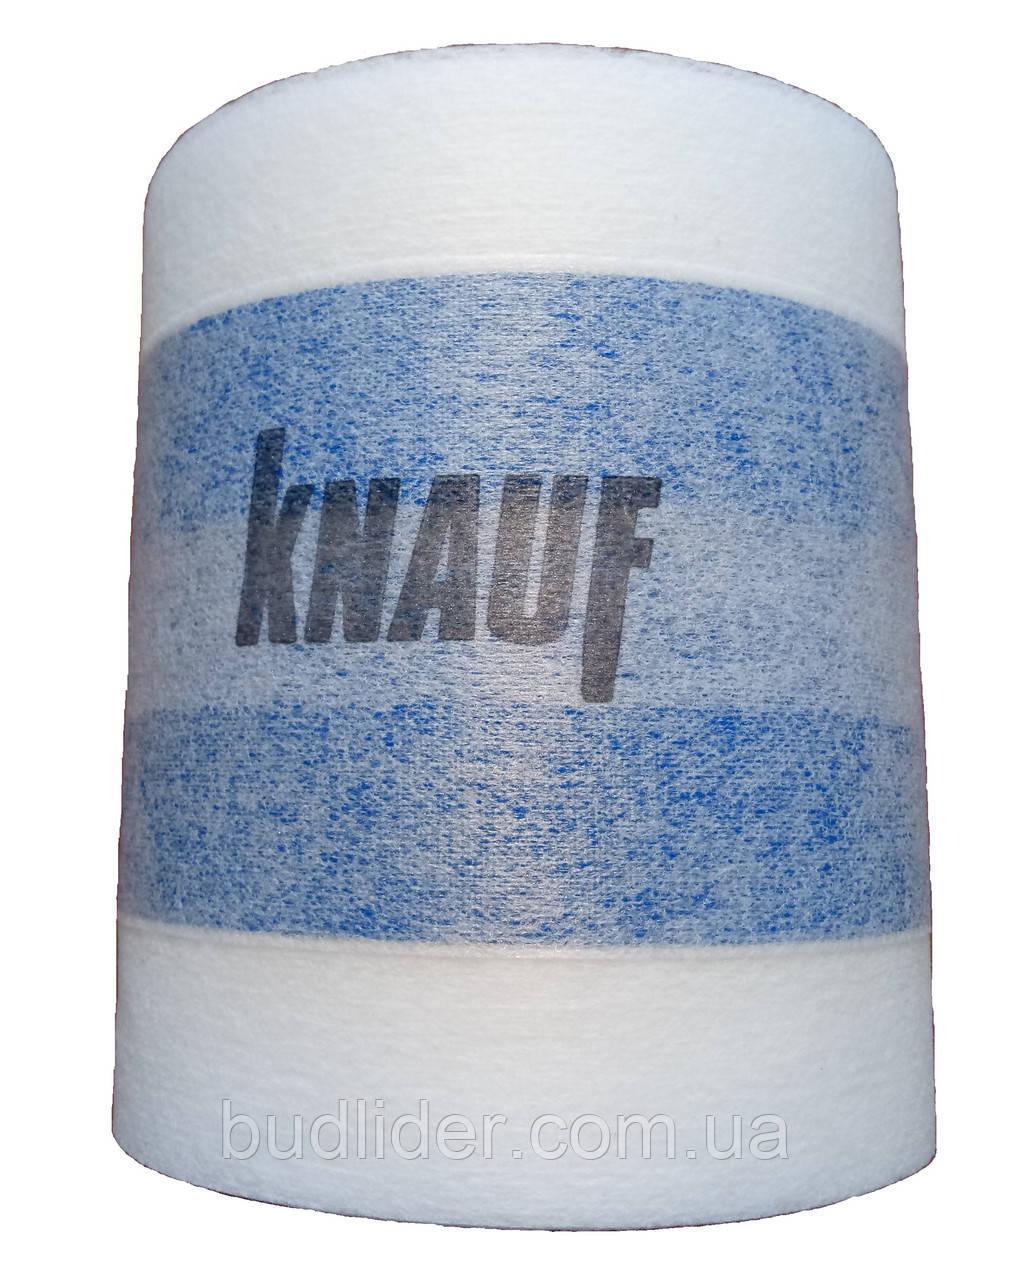 Герметизирующая лента KNAUF Flächendichtband 50м